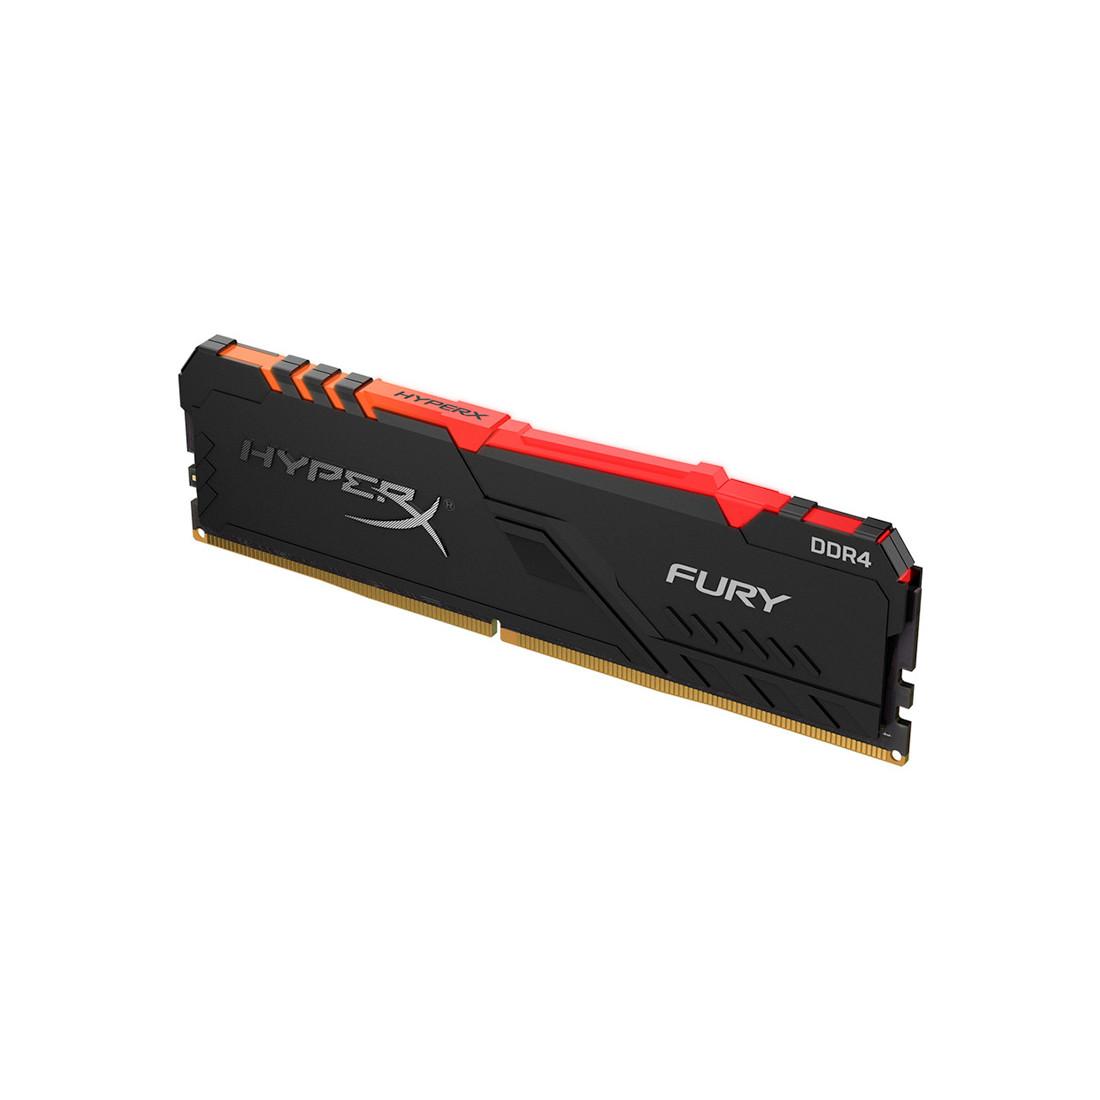 ОЗУ Kingston HyperX Fury RGB 8GB 2666MHz DDR4 CL16 DIMM XMP HX426C16FB3A/8